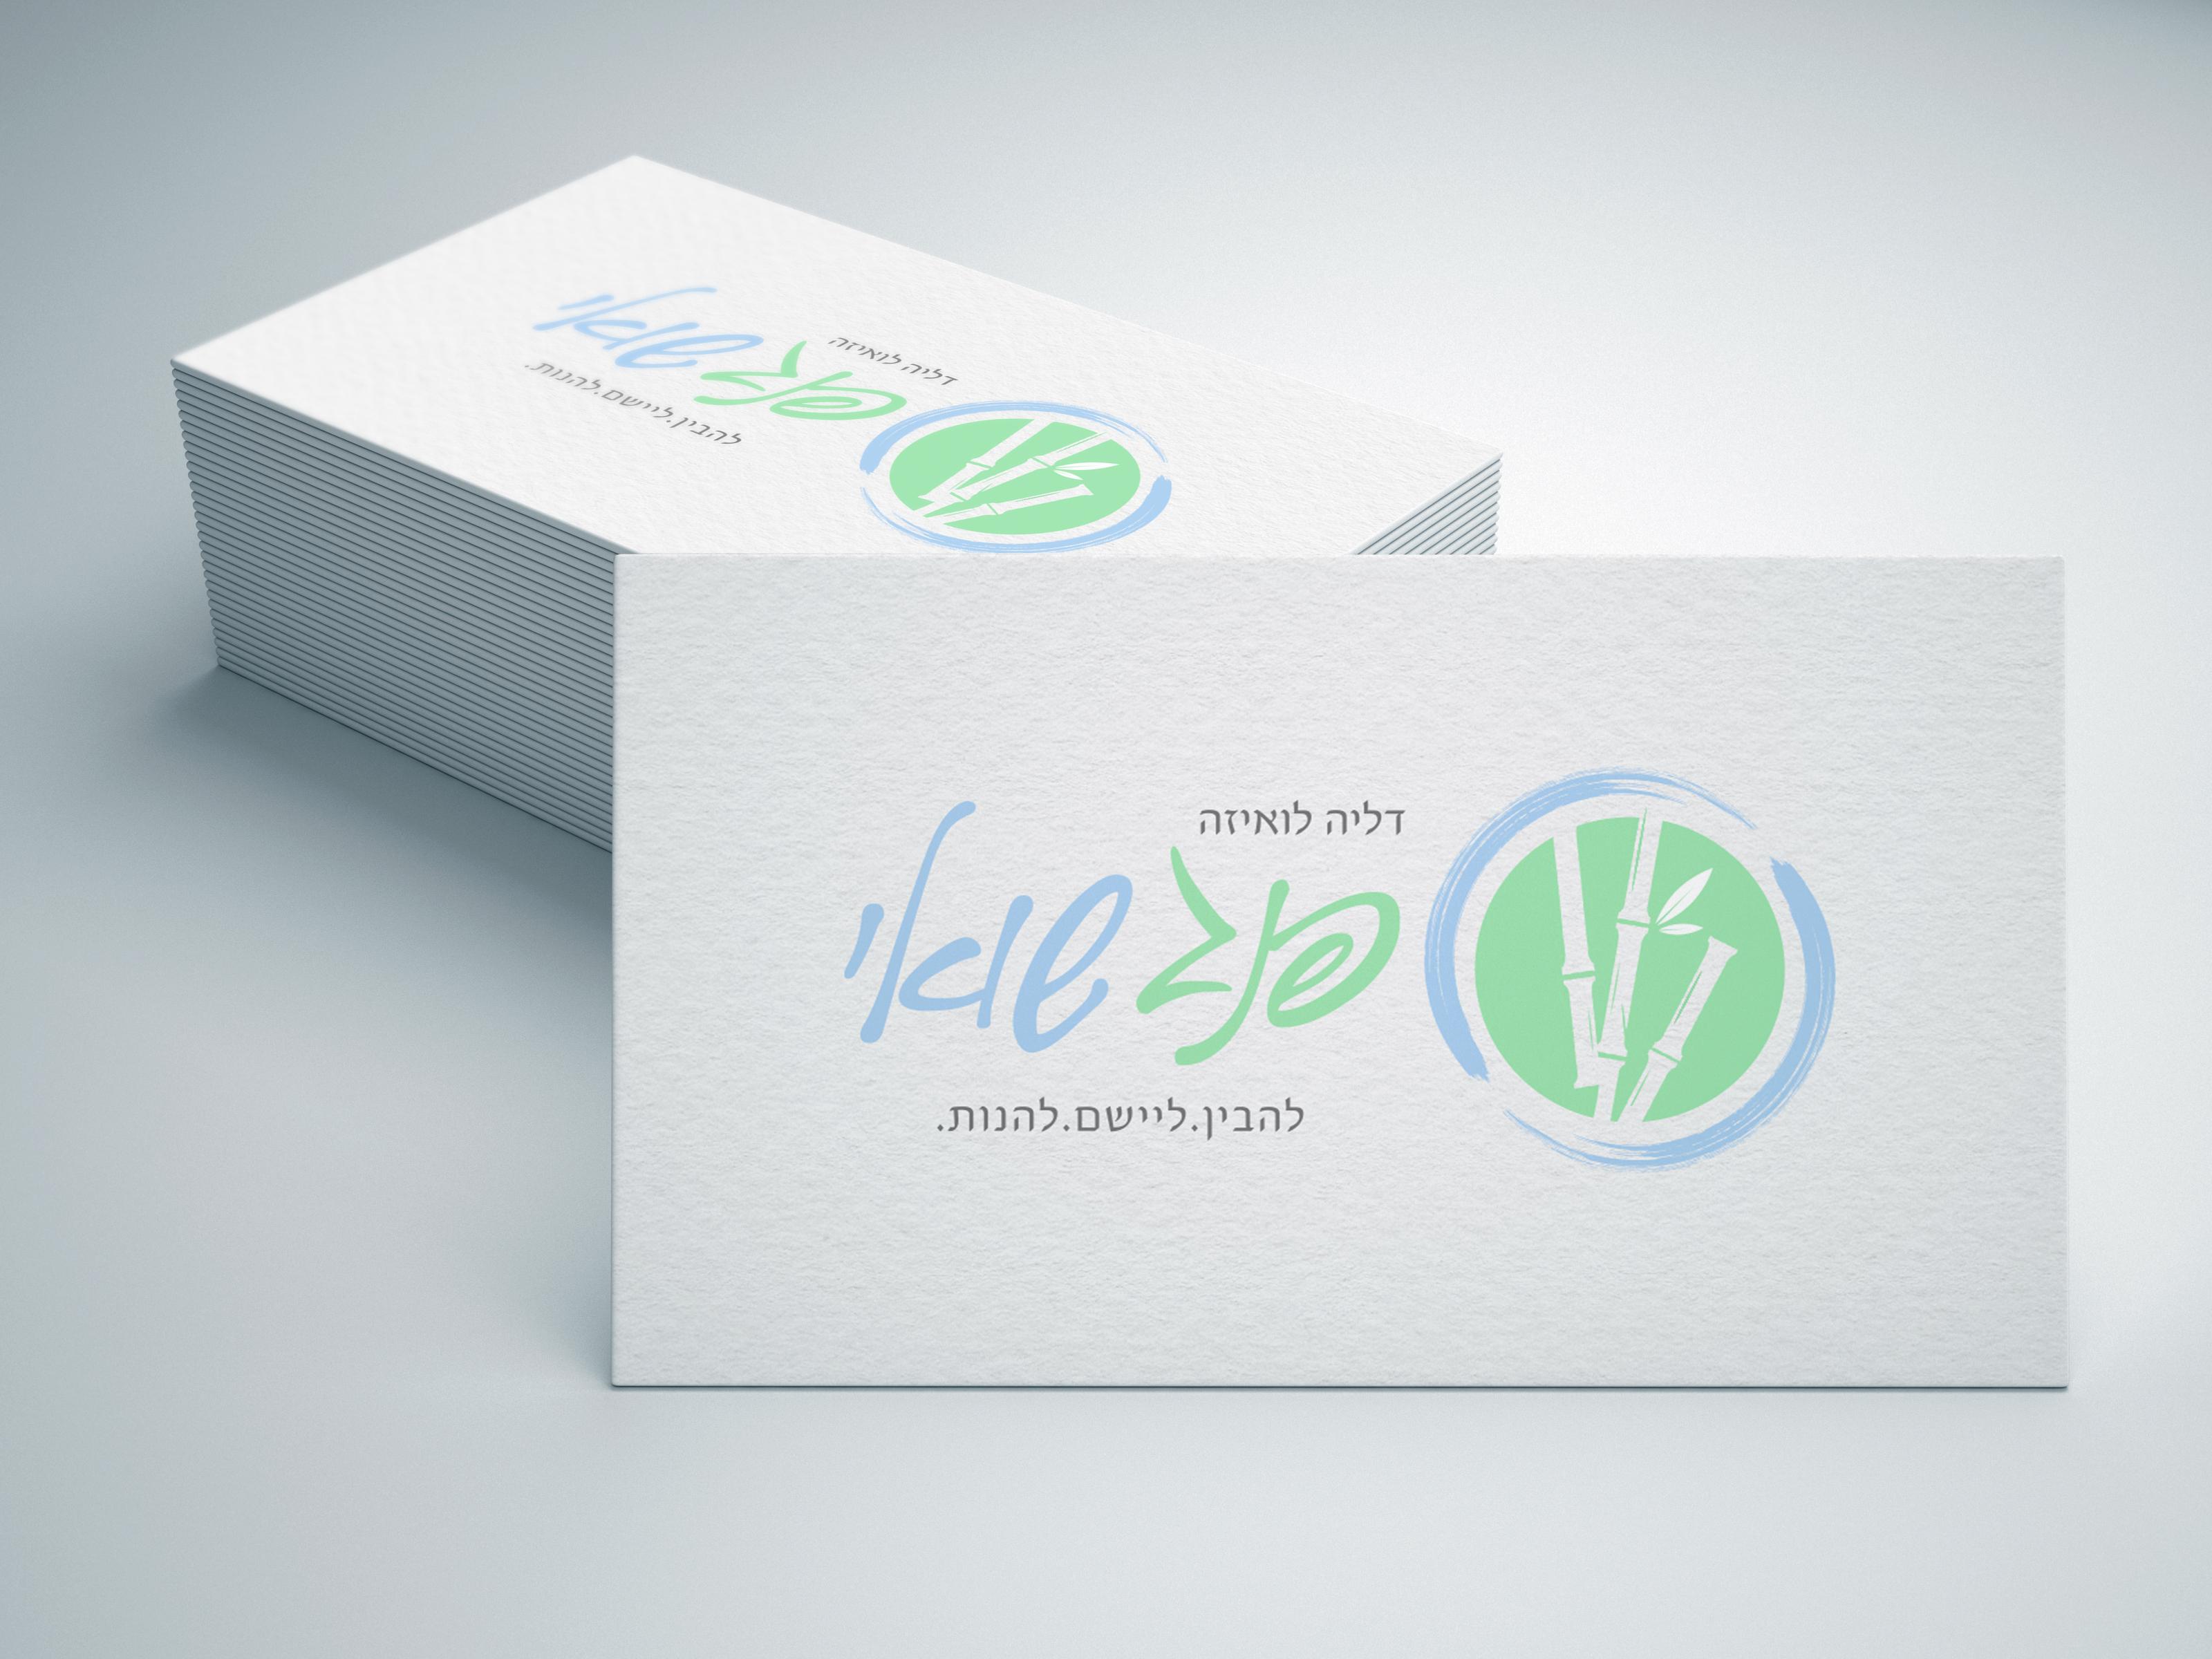 feng shui logo design